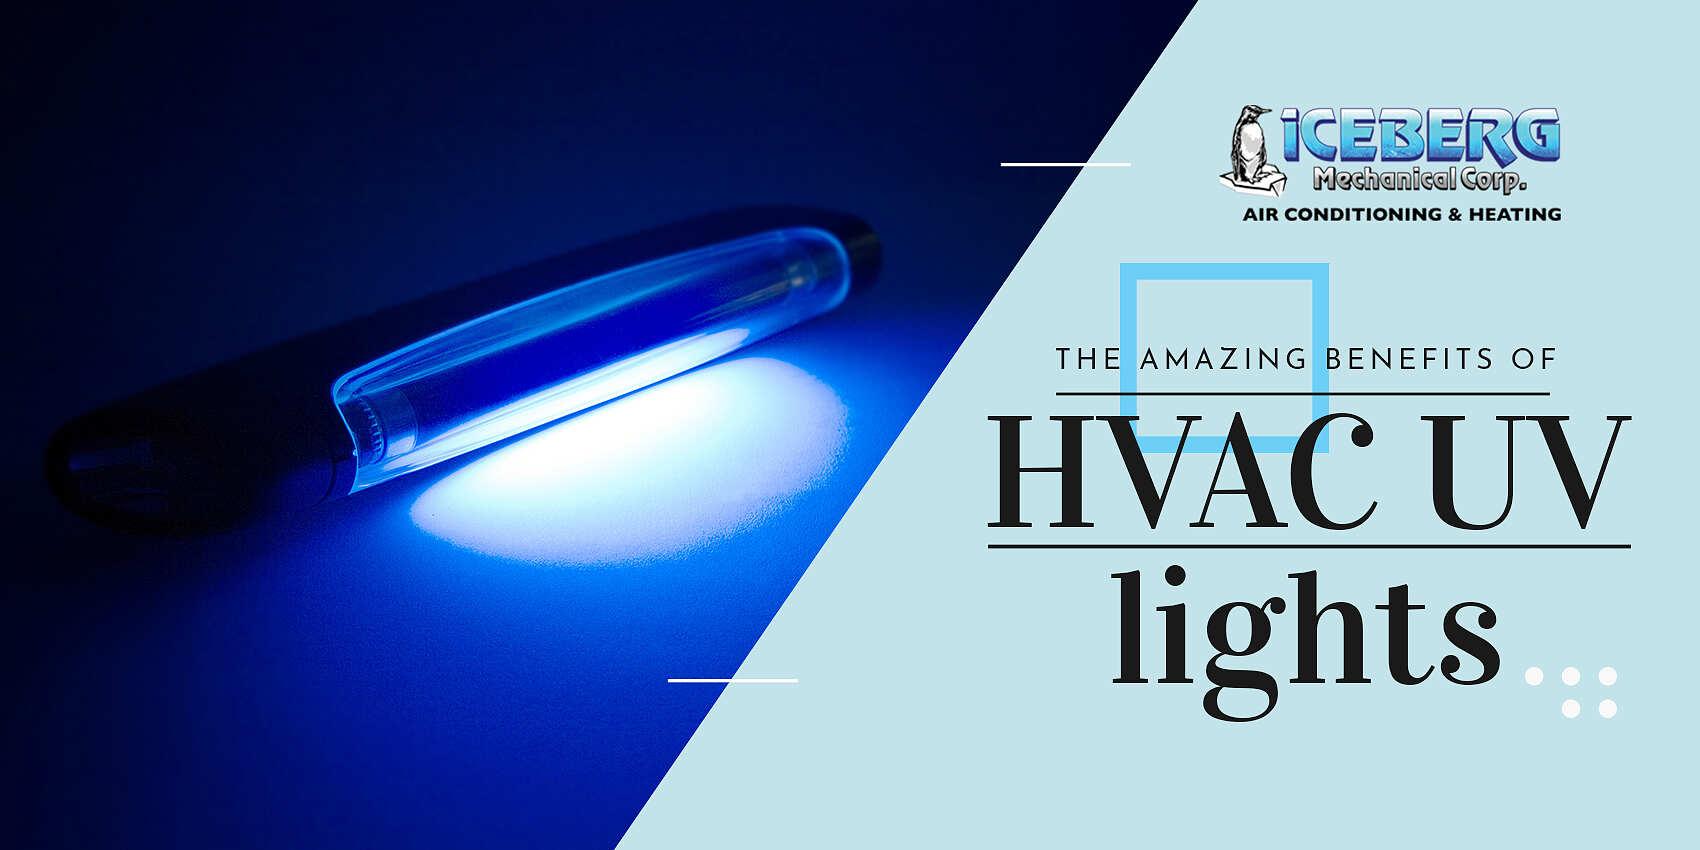 The Amazing Benefits of HVAC UV Lights